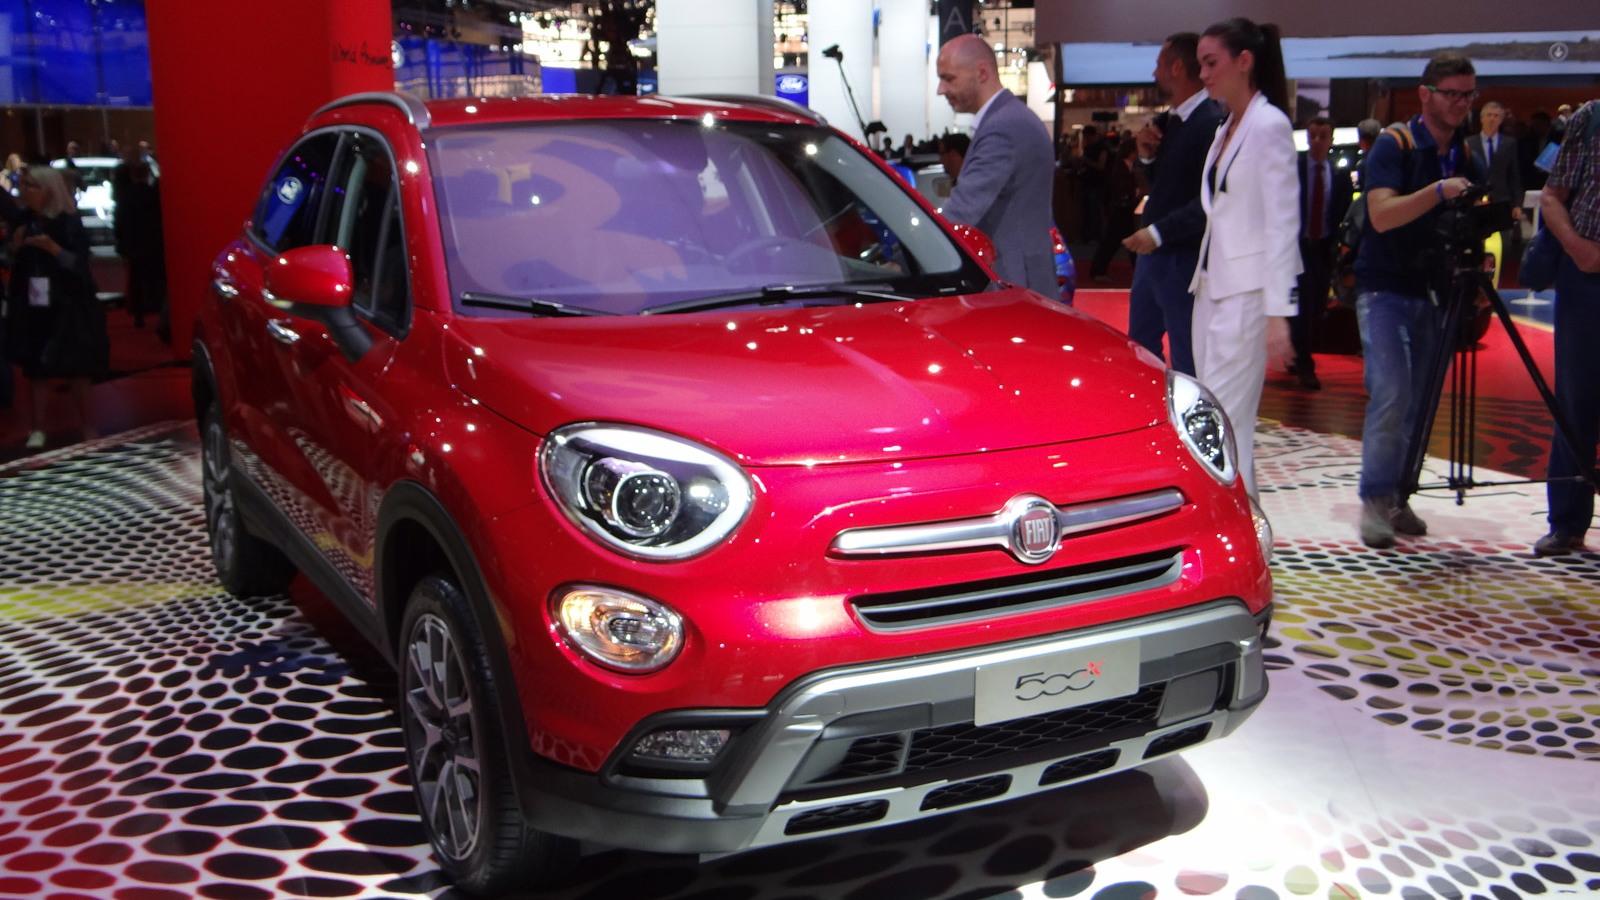 2016 Fiat 500X, 2014 Paris Auto Show